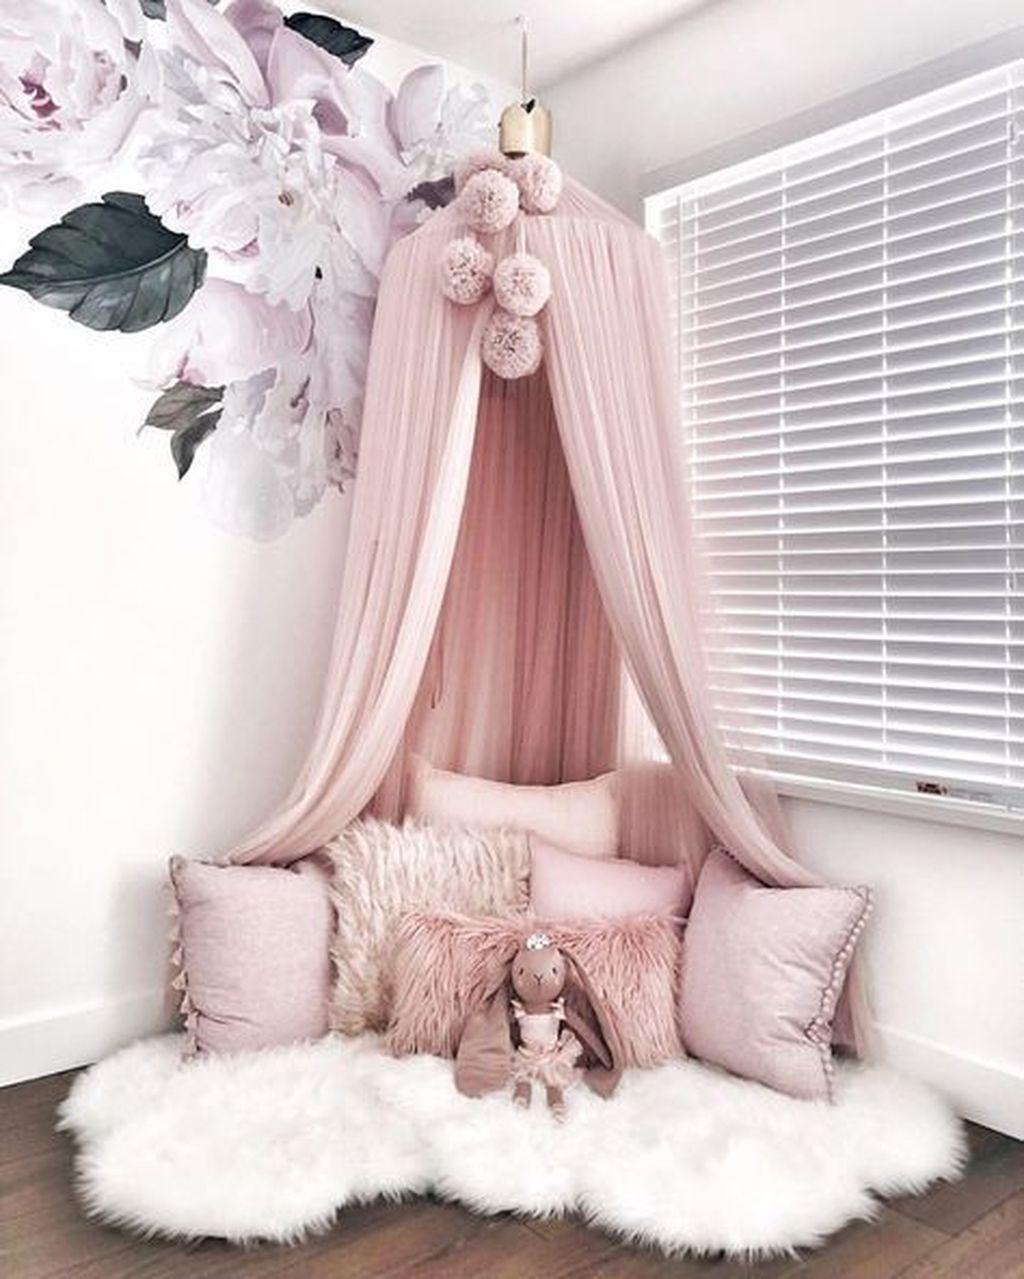 Fantastic Industrial Bedroom Design Ideas 13